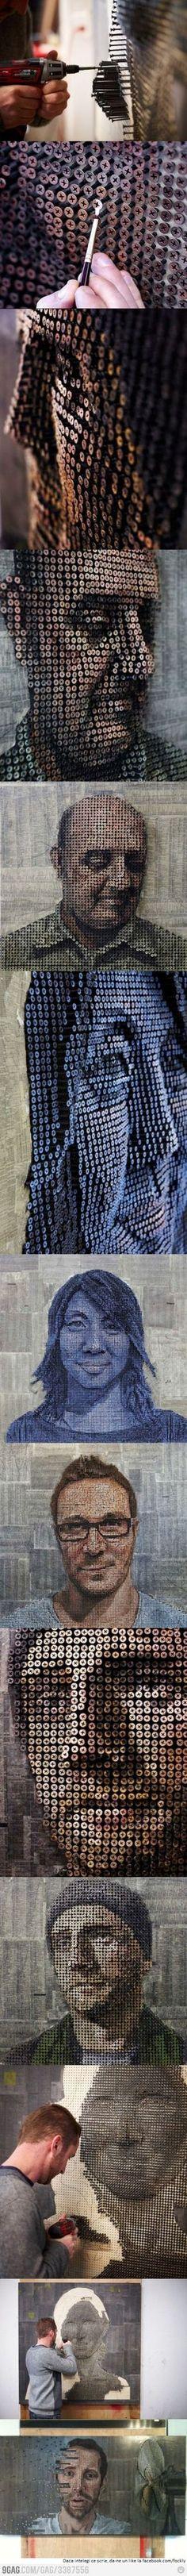 Increibles retratos en 3D hechos con tirafondos por Andrew Myers